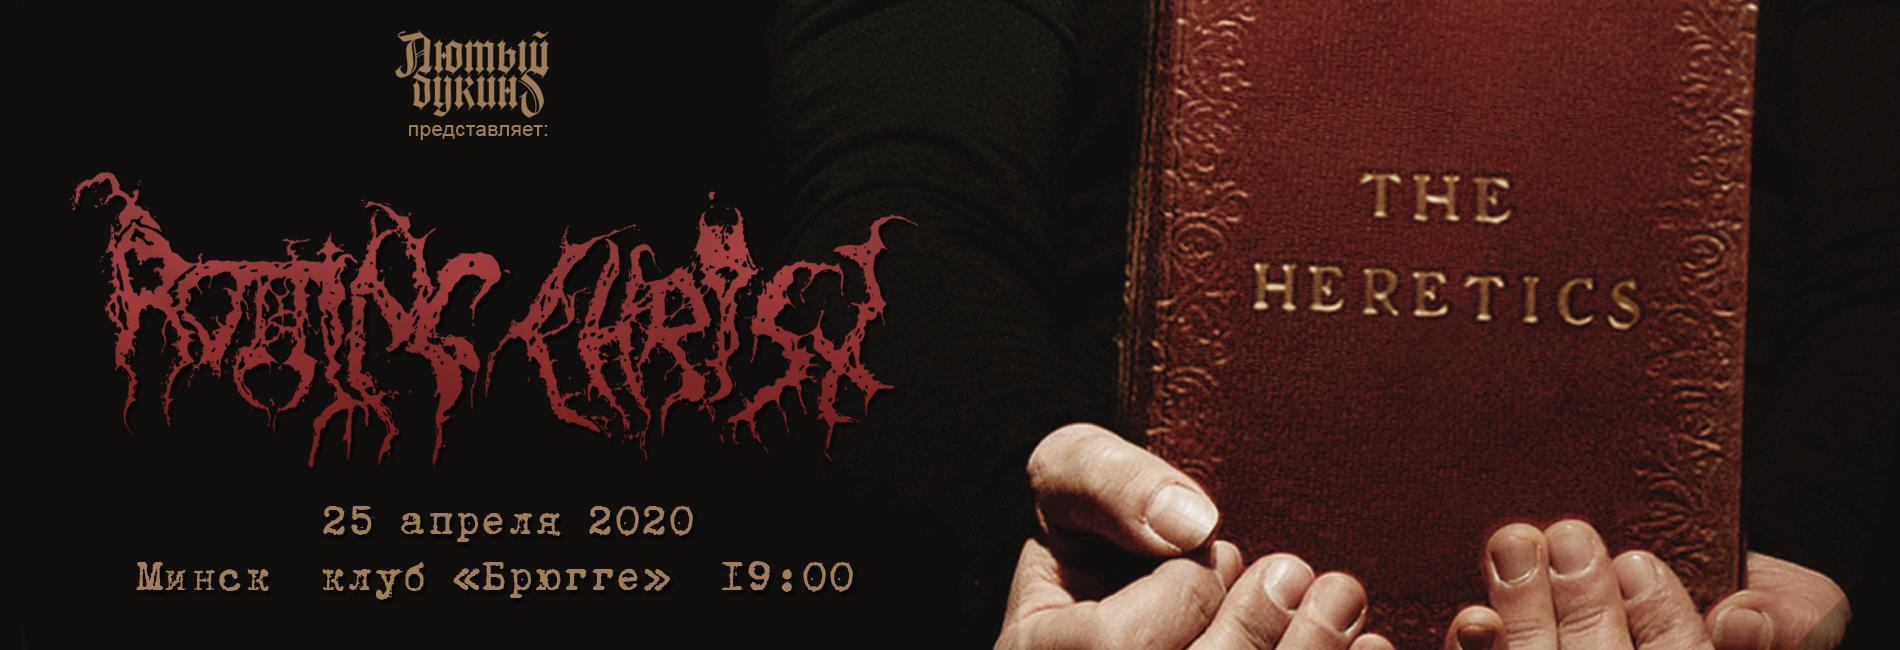 Rotting Christ 25 апреля 2020 Клуб «Брюгге» Минск